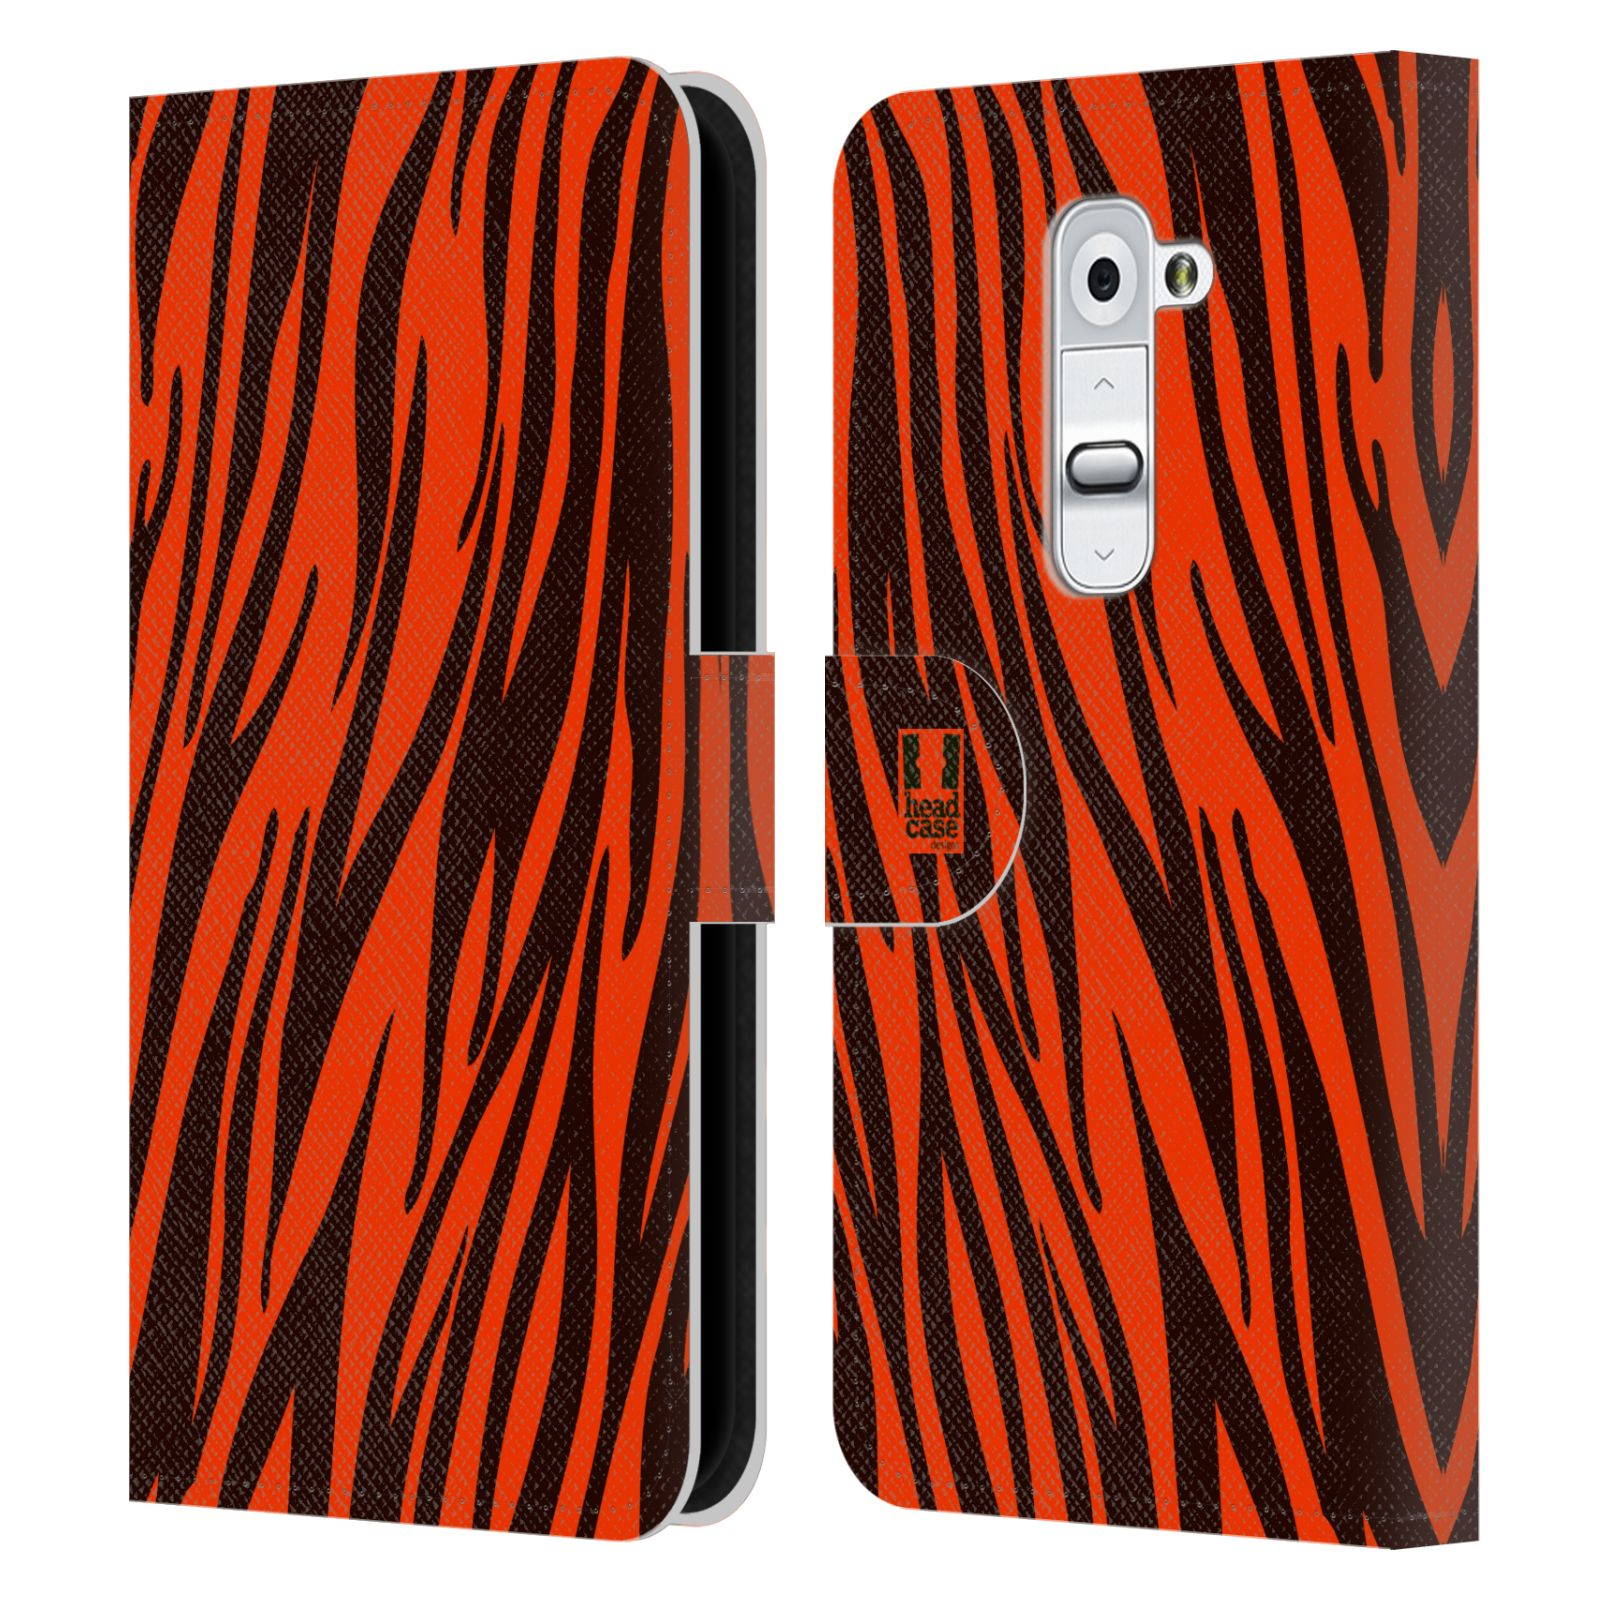 HEAD CASE Flipové pouzdro pro mobil LG G2 (D802) Zvířecí barevné vzory oranžový tygr